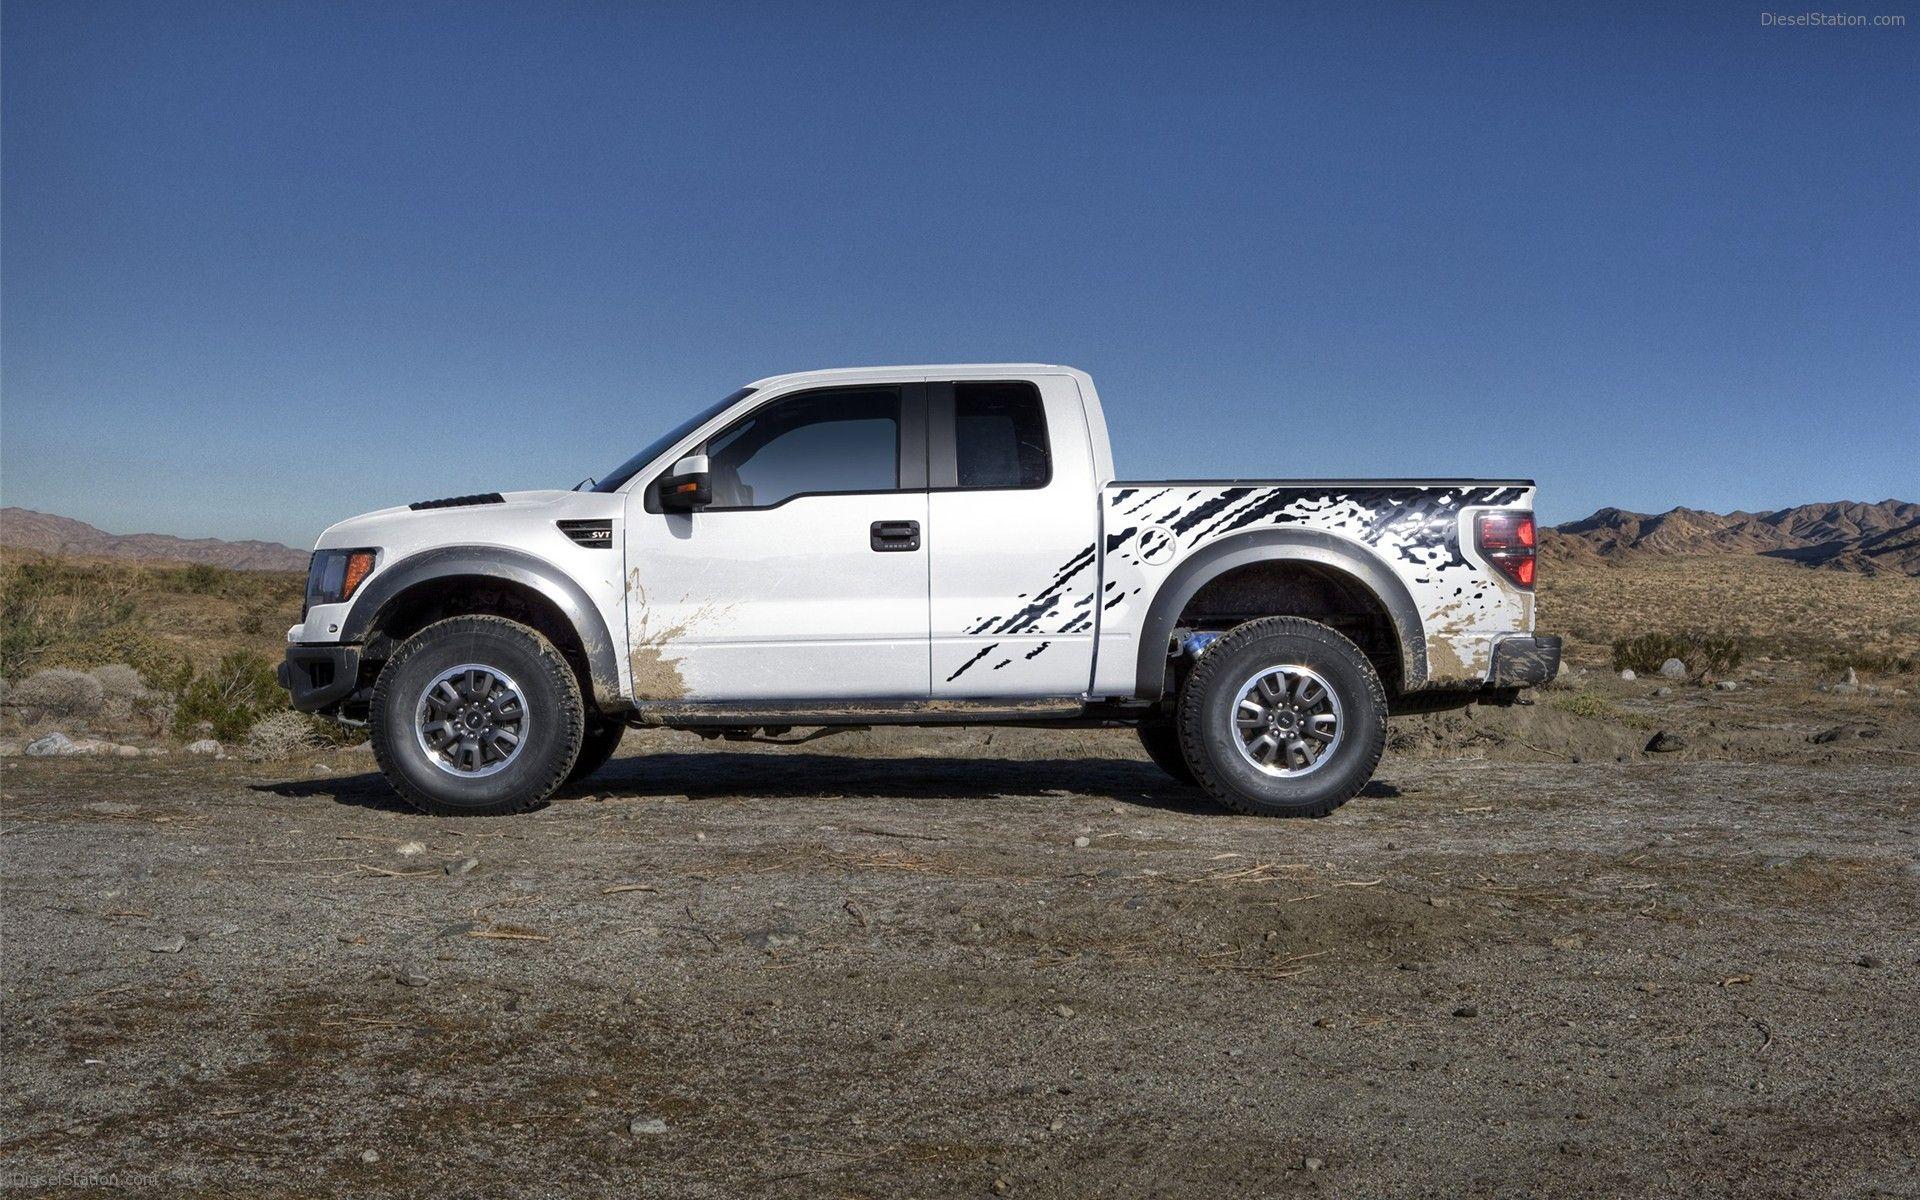 2017 Ford F150 Raptor Svt raptor, Raptor truck, Trucks